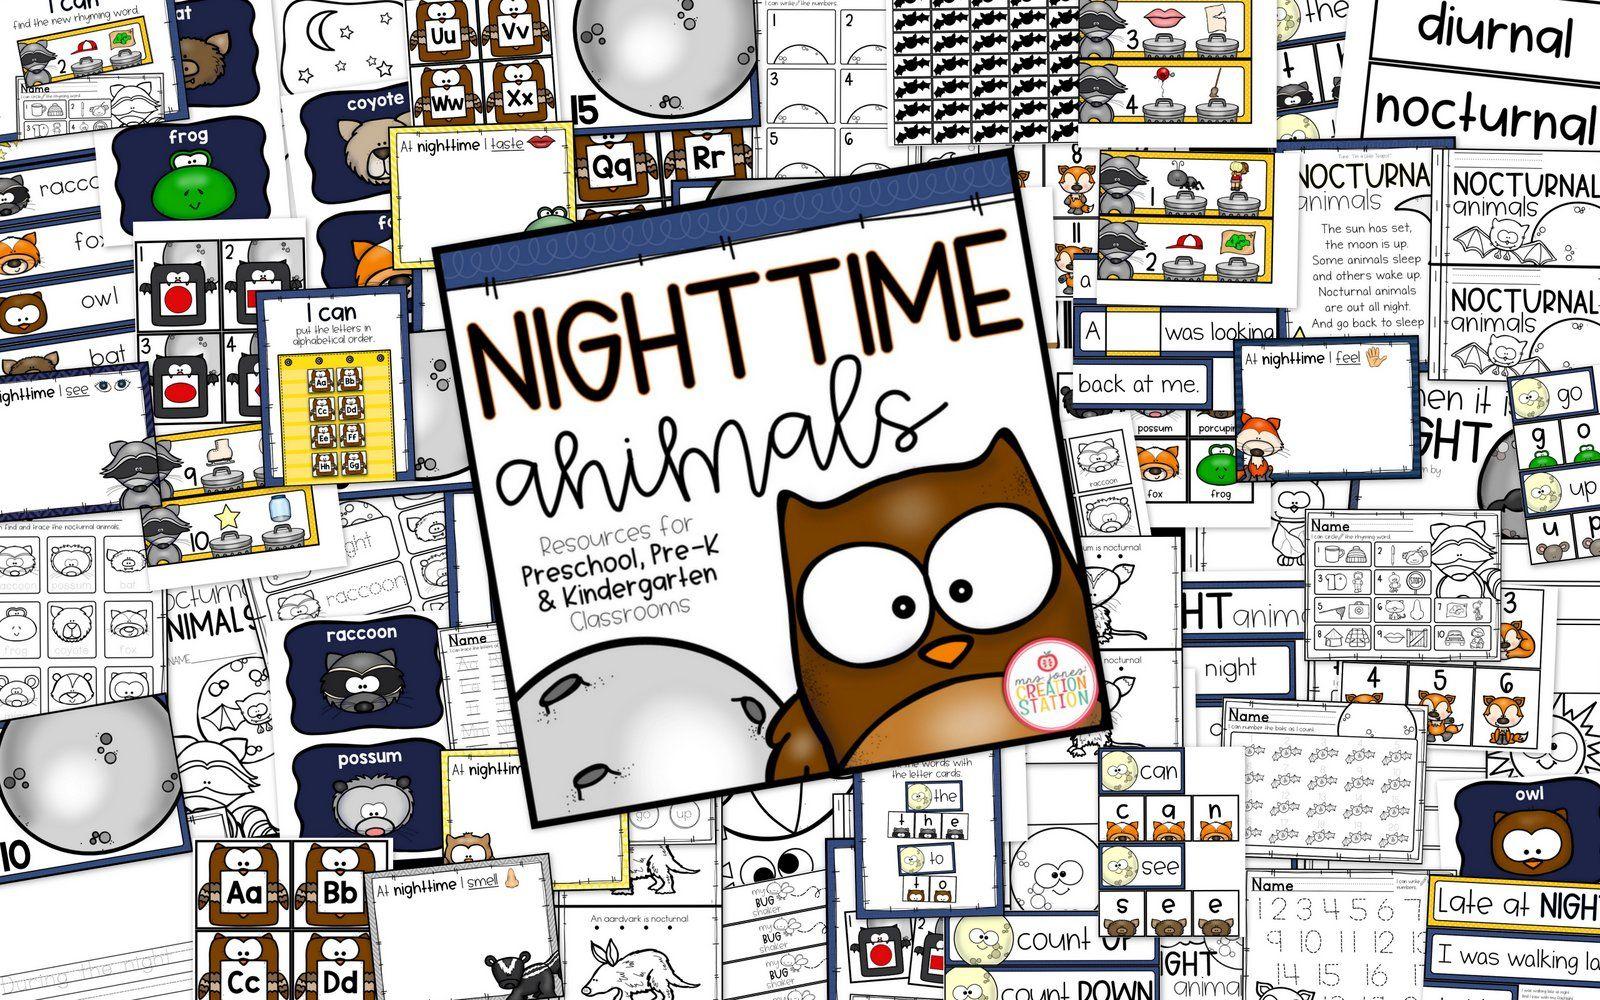 Nocturnal Animals Theme Activities For Preschool Pre K